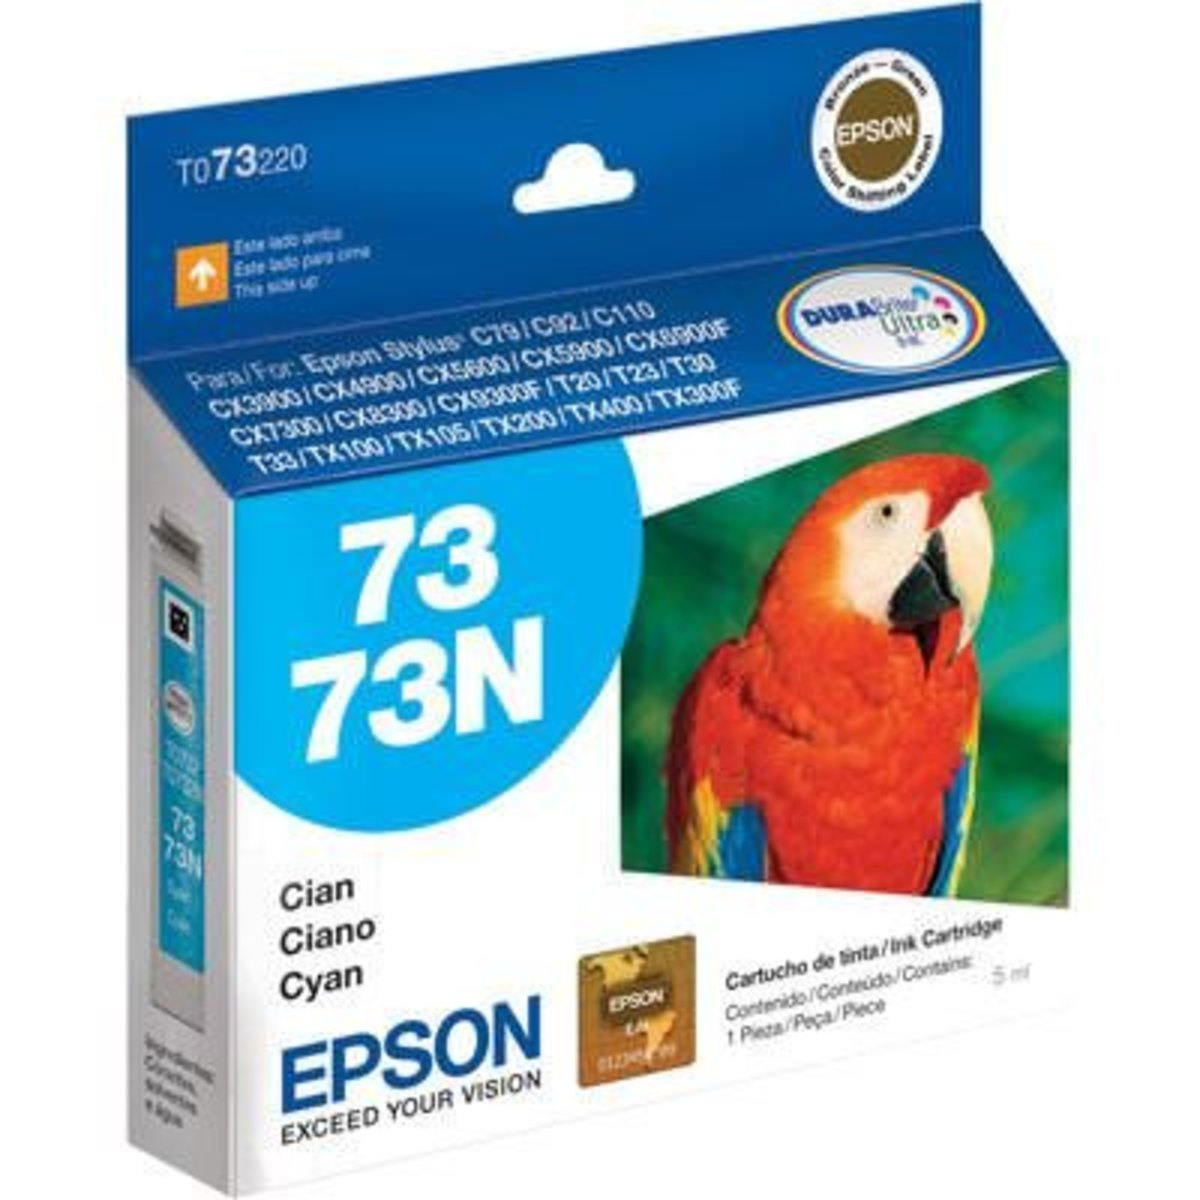 CARTUCHO EPSON 732N CIANO